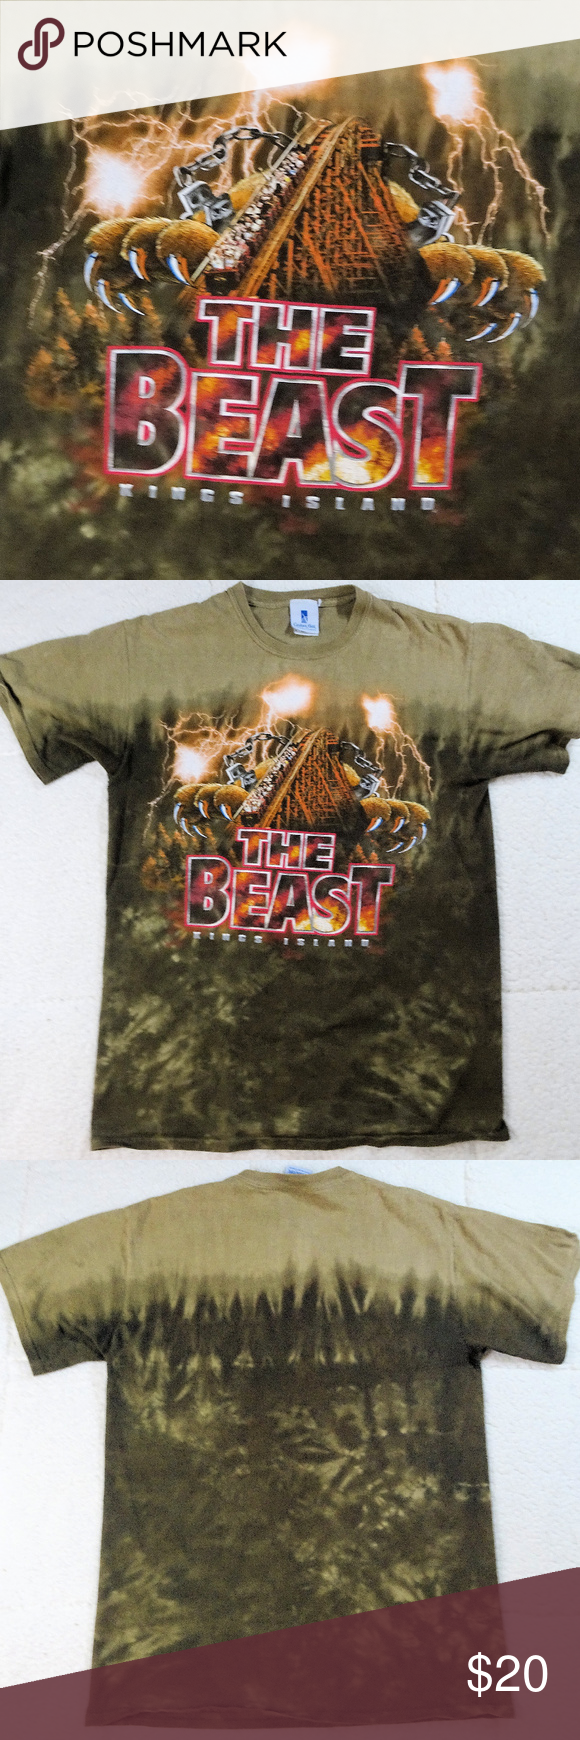 Kings Island The Beast T Shirt Medium Shirts Clothes Design Kings Island